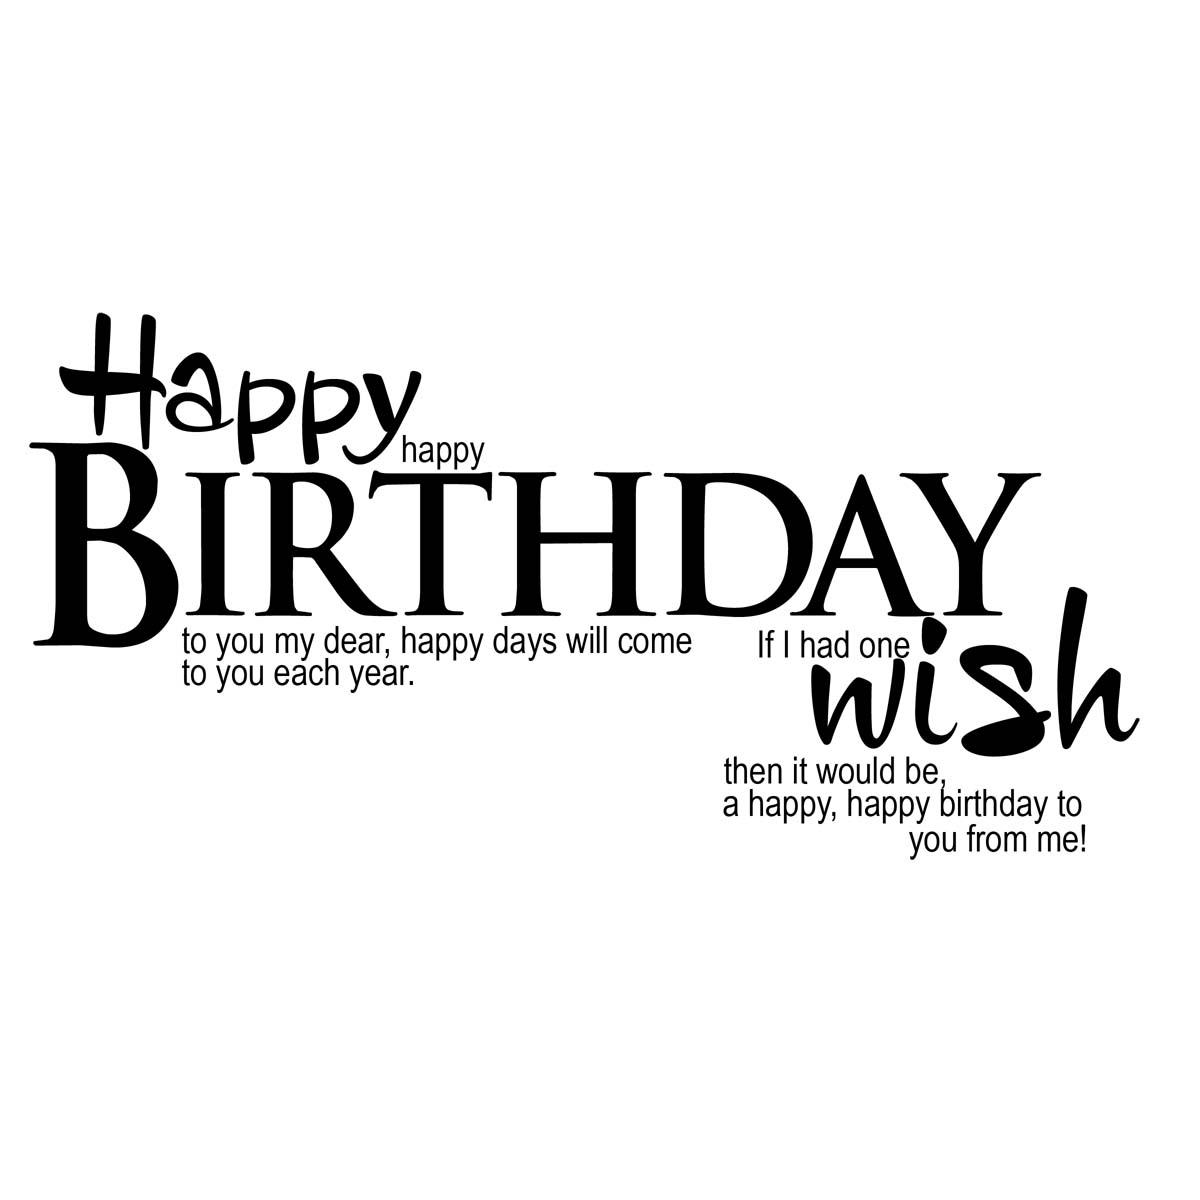 Funny Happy Birthday Facebook Quotes: Happy Birthday Boss Funny Quotes. QuotesGram